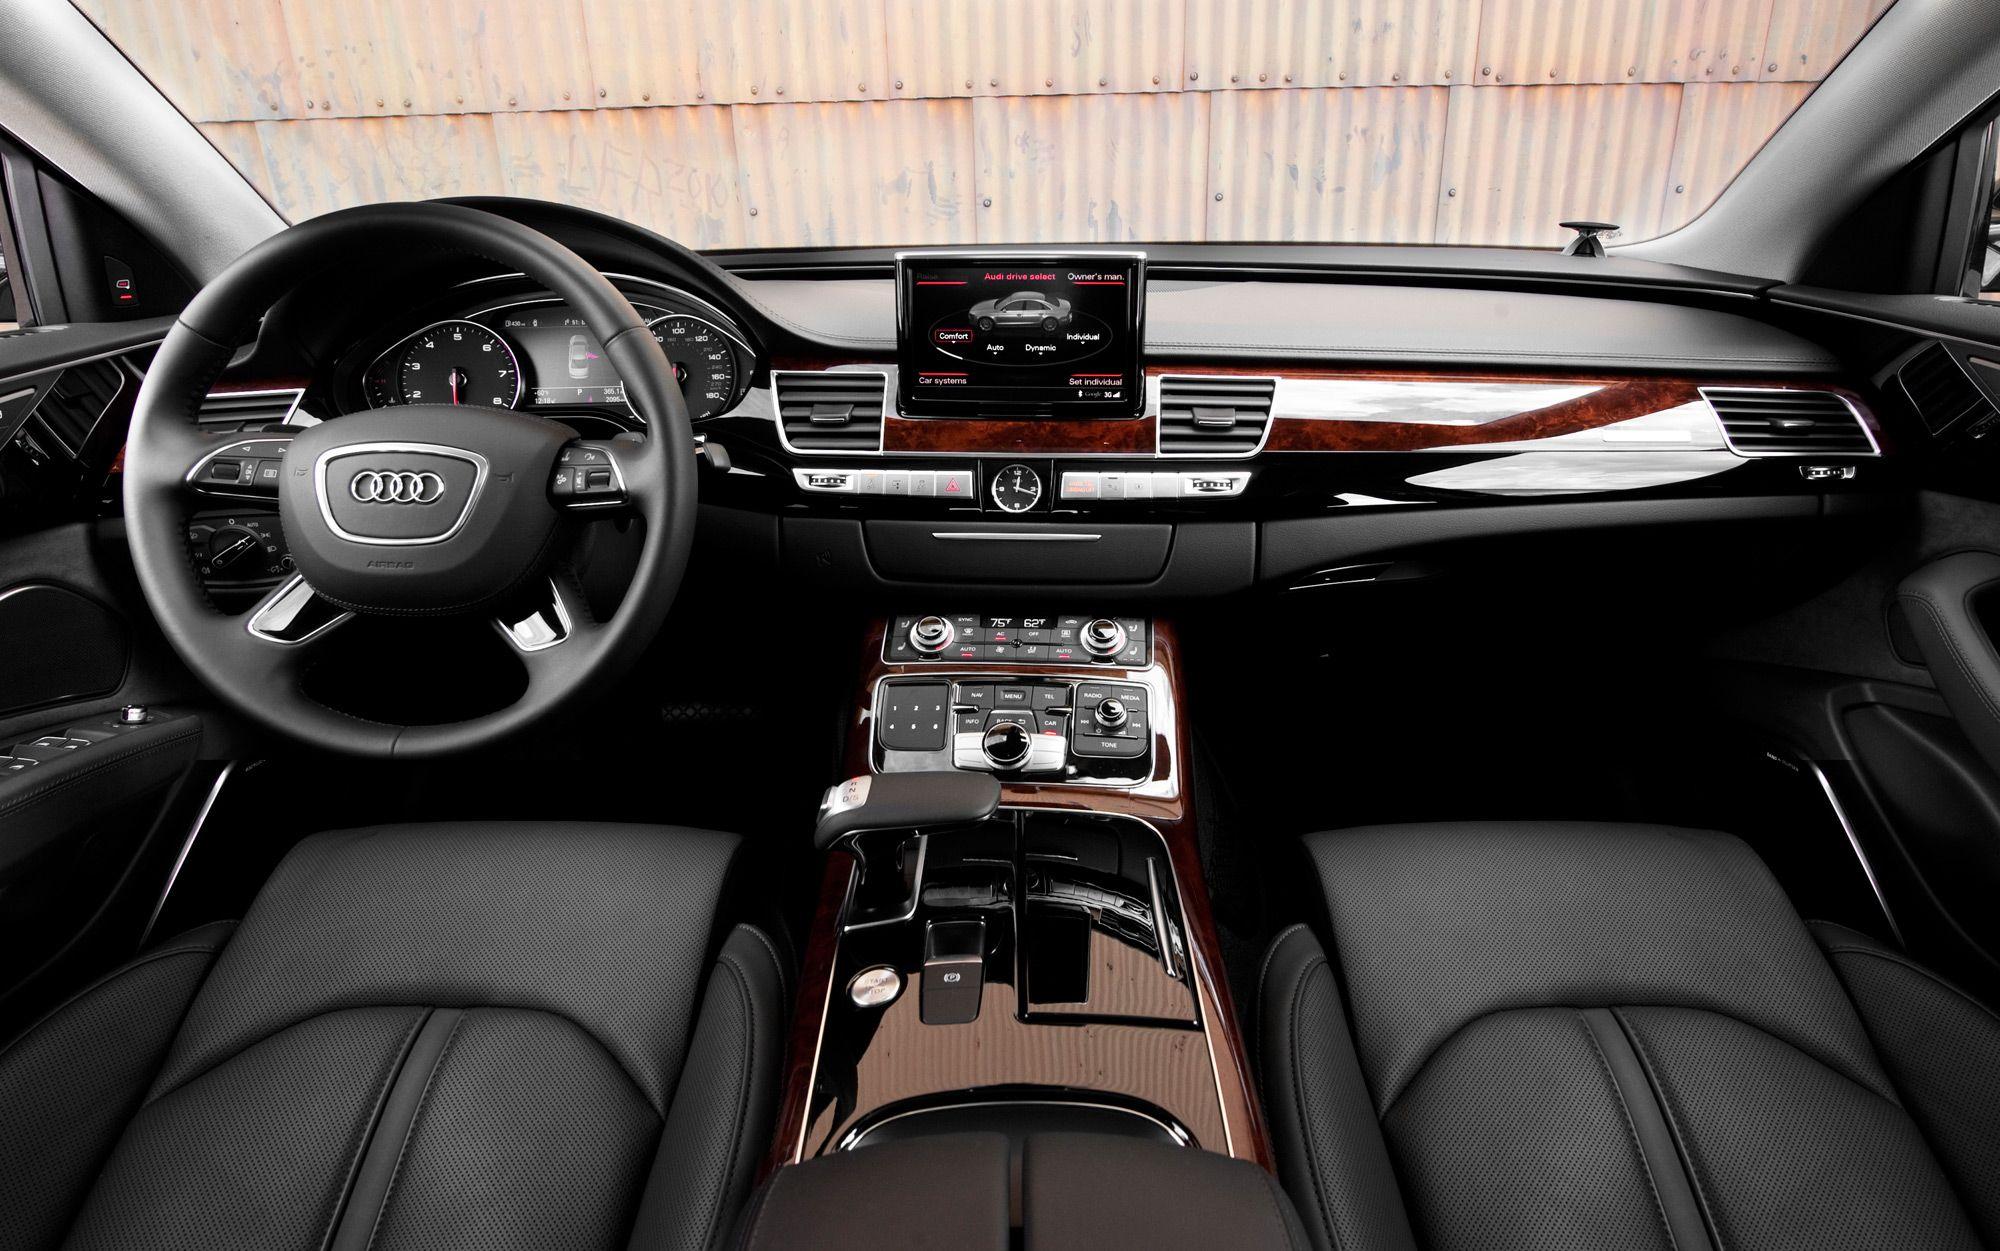 Audi A8 Interior Image 75 Audi A8 Audi Audi Interior